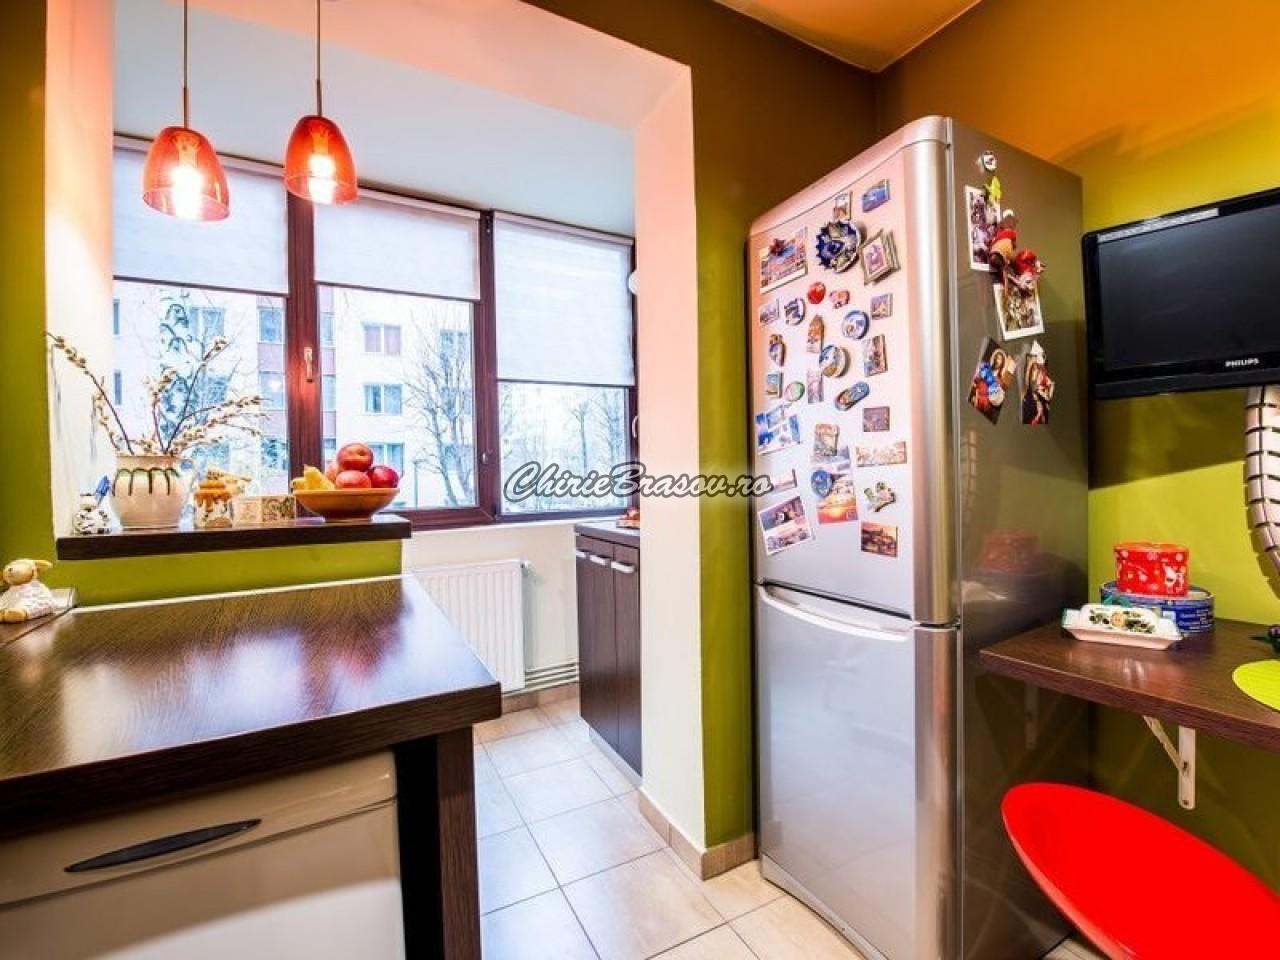 Inchiriere apartament 2 camere Brasov , Central - Grivitei-353-13